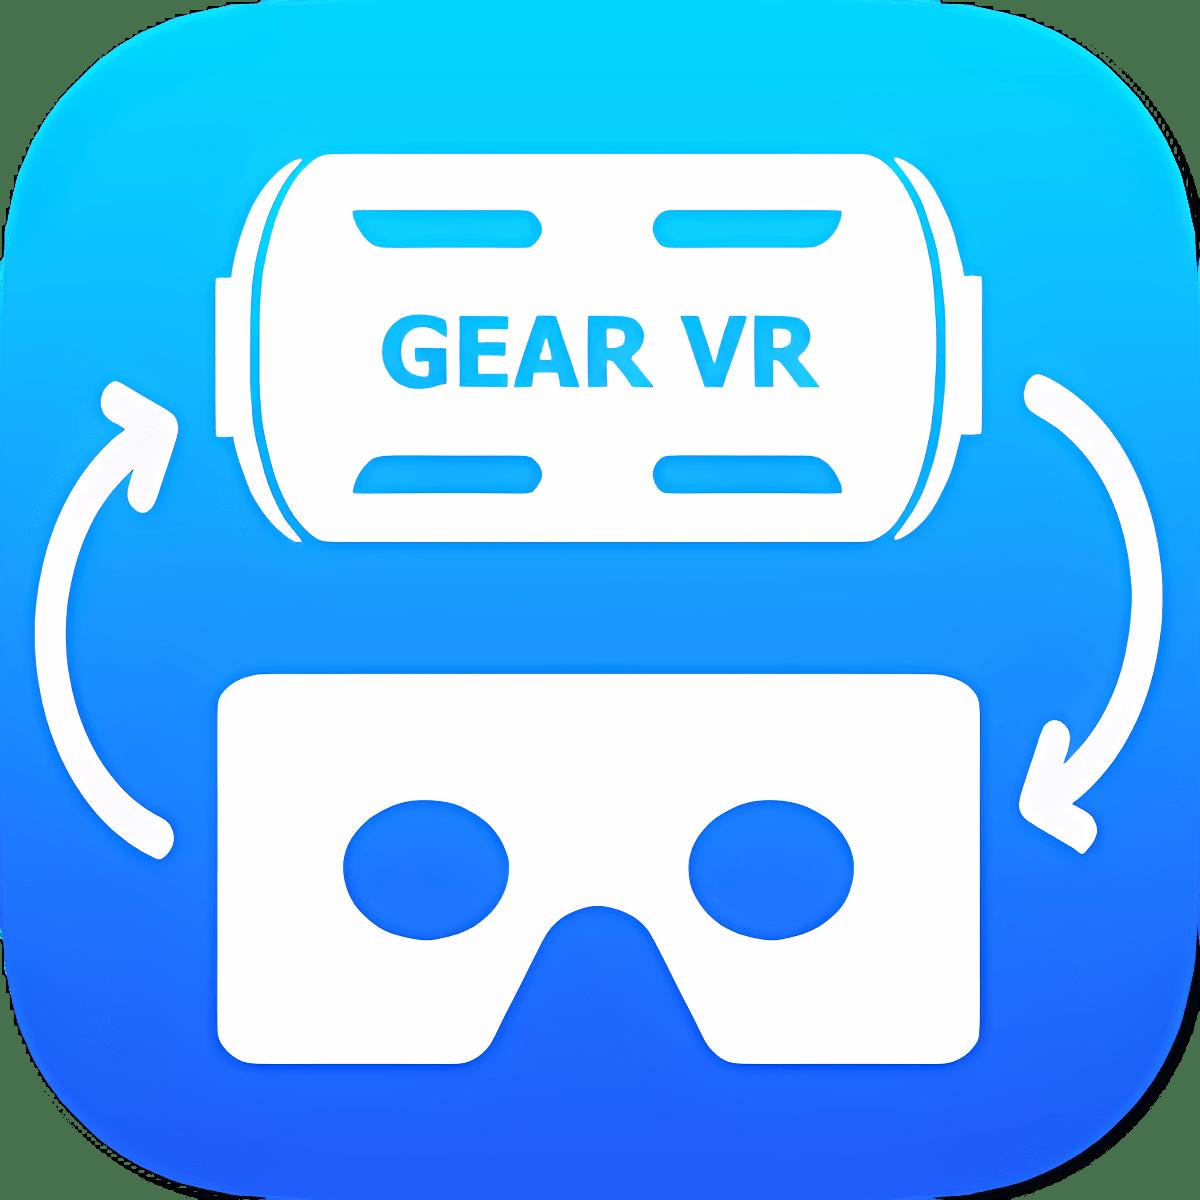 Play Cardboard apps on Gear VR 1.3.4